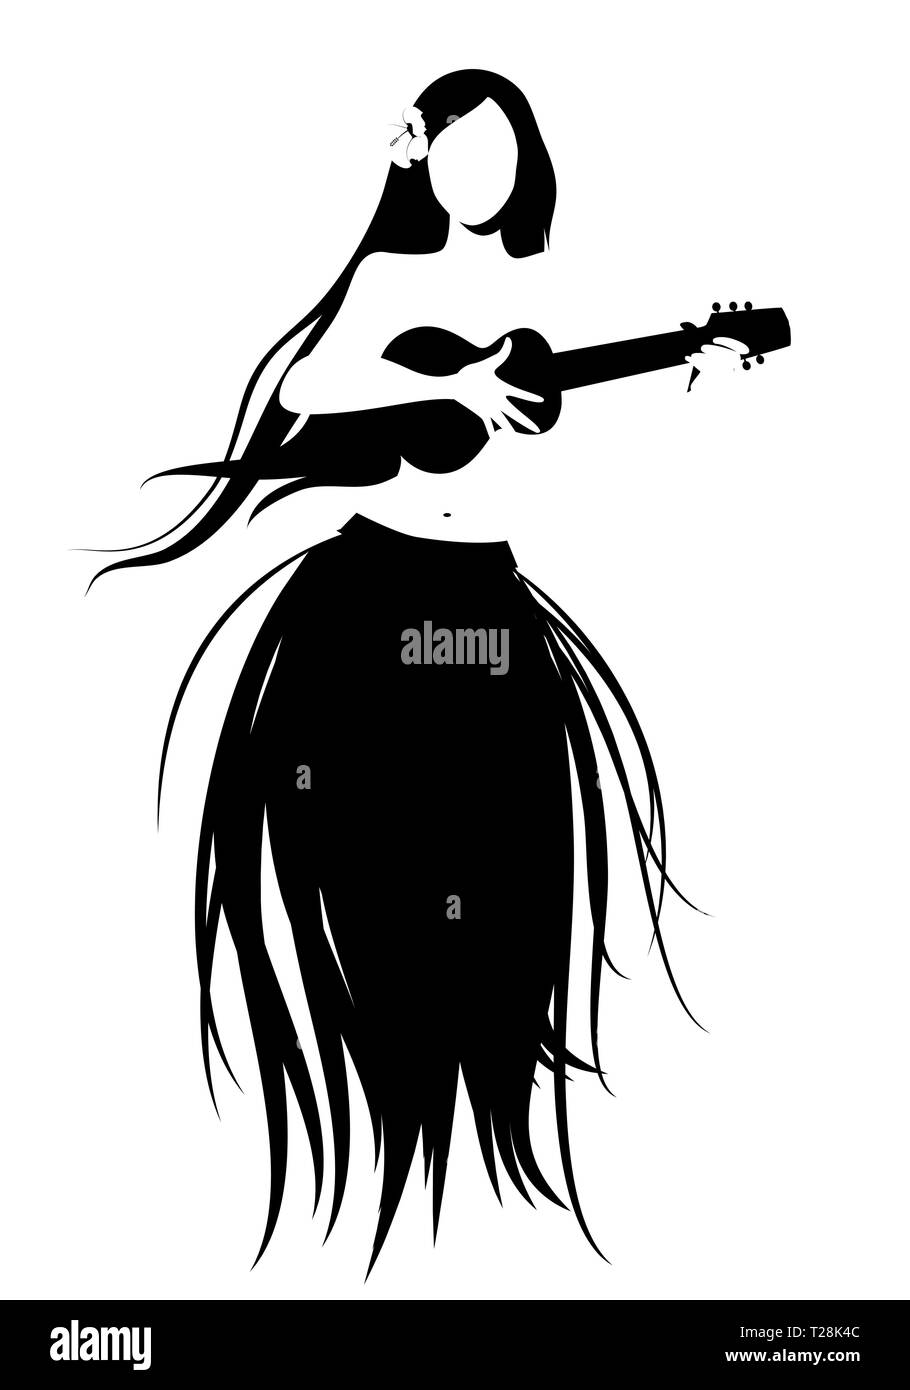 Silhouette of Hawaiian girl wearing skirt of leaves playing ukulele isolated on white background. - Stock Image